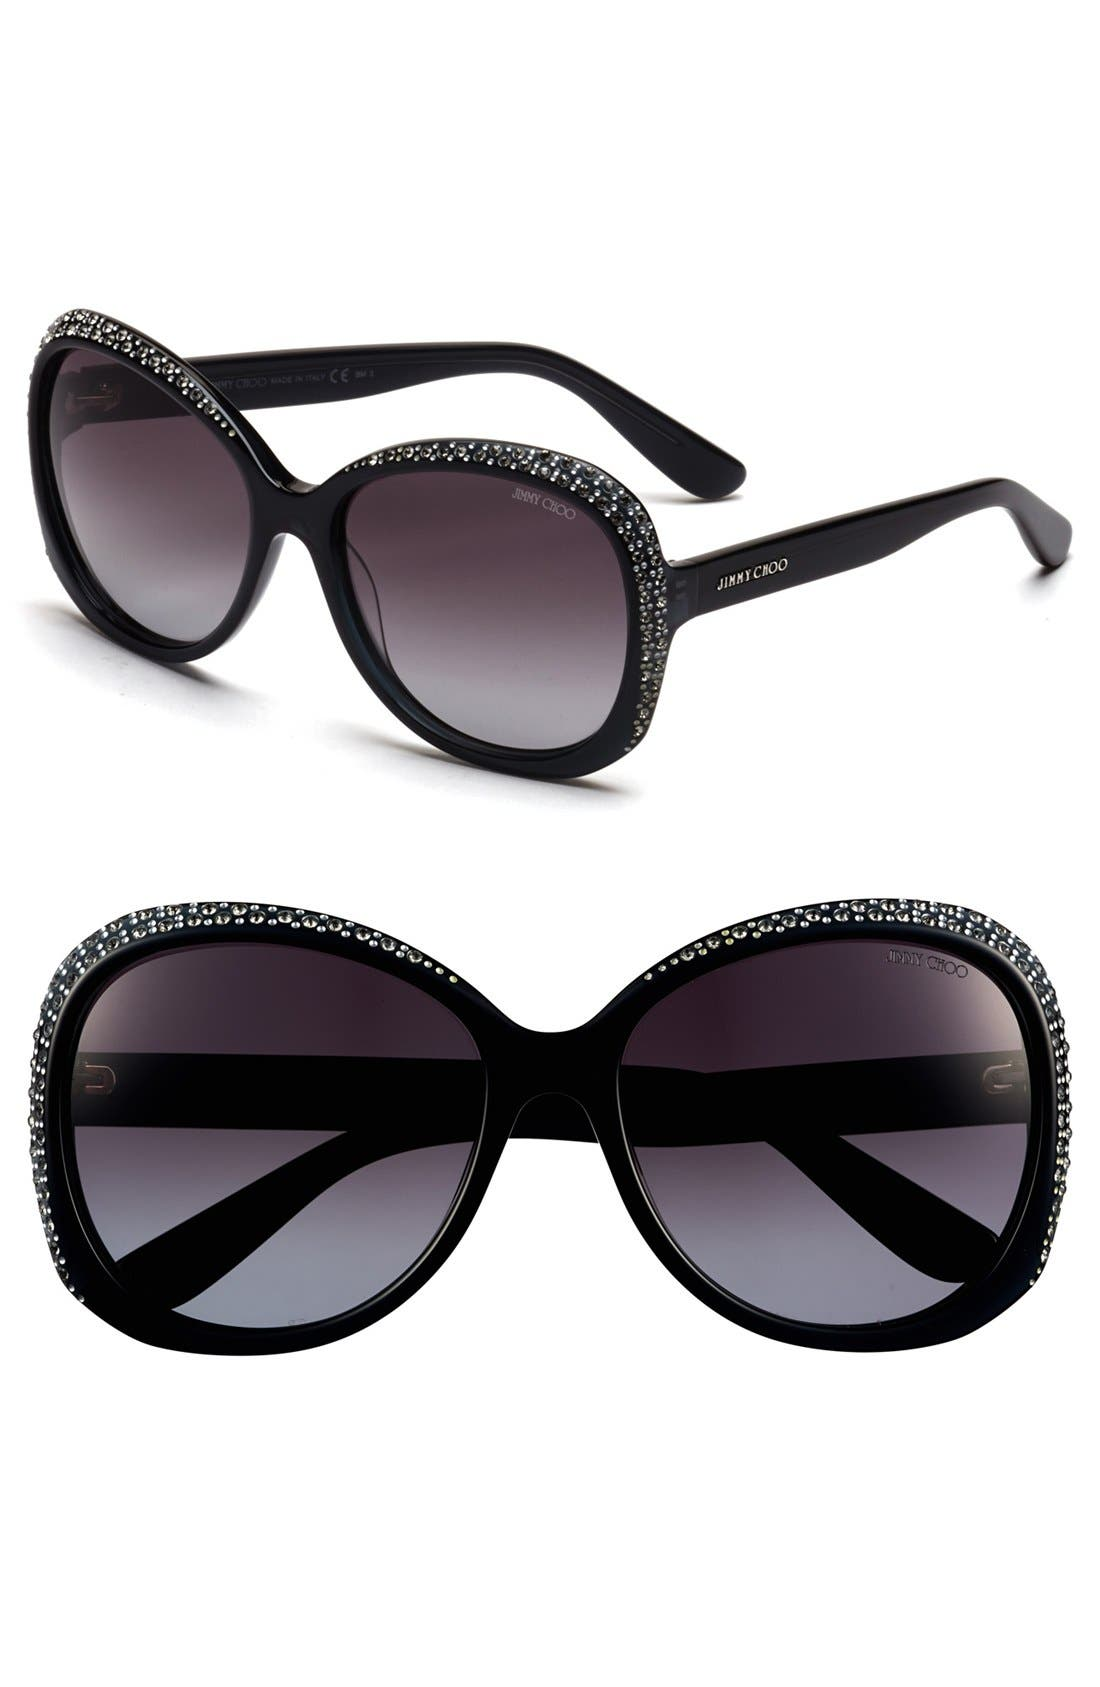 Alternate Image 1 Selected - Jimmy Choo 58mm Sunglasses